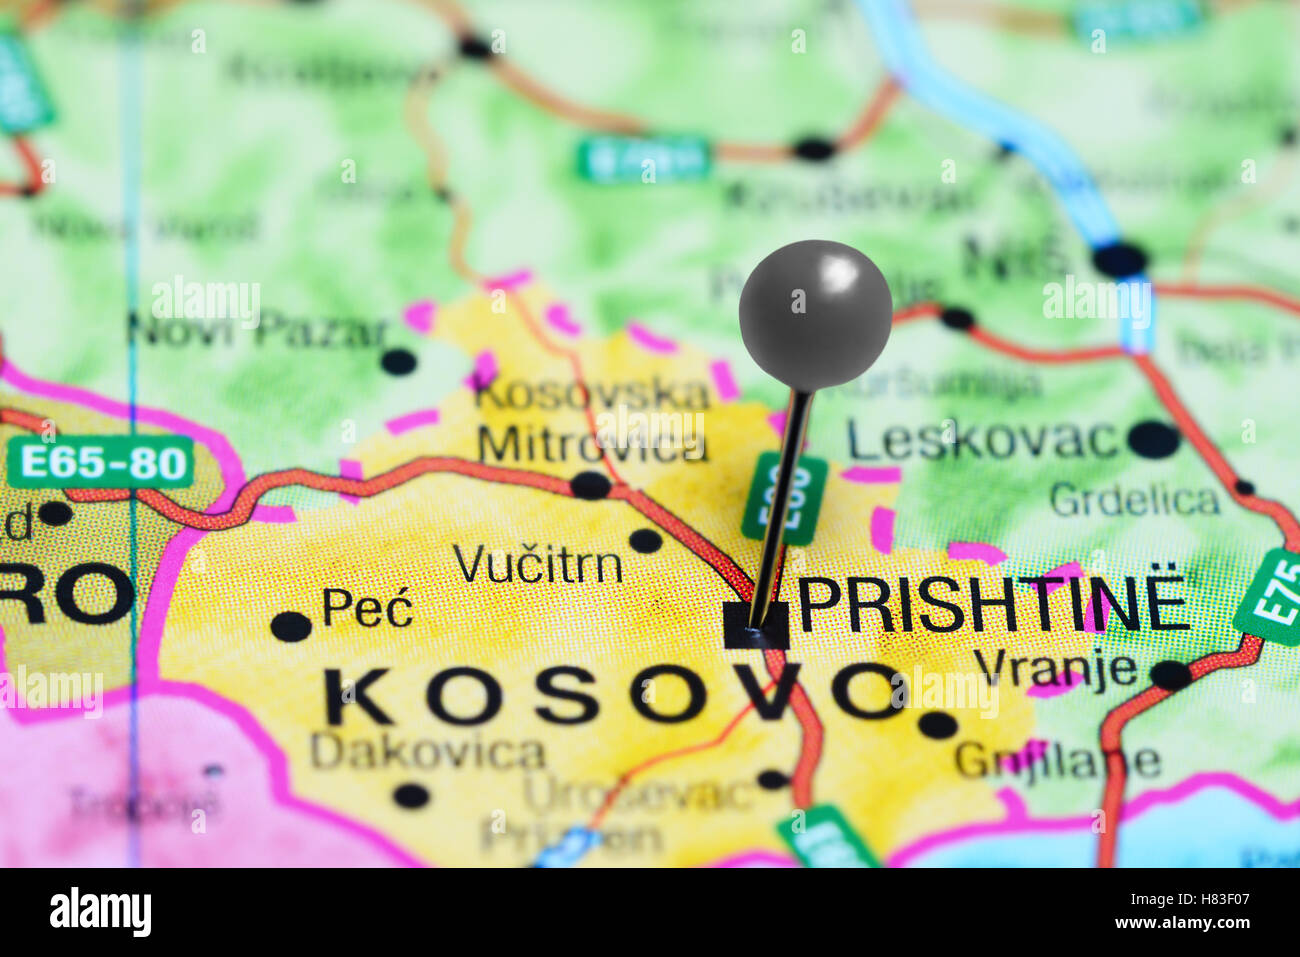 Pristina Pinned On A Map Of Kosovo Stock Photo Royalty Free Image - pristina map